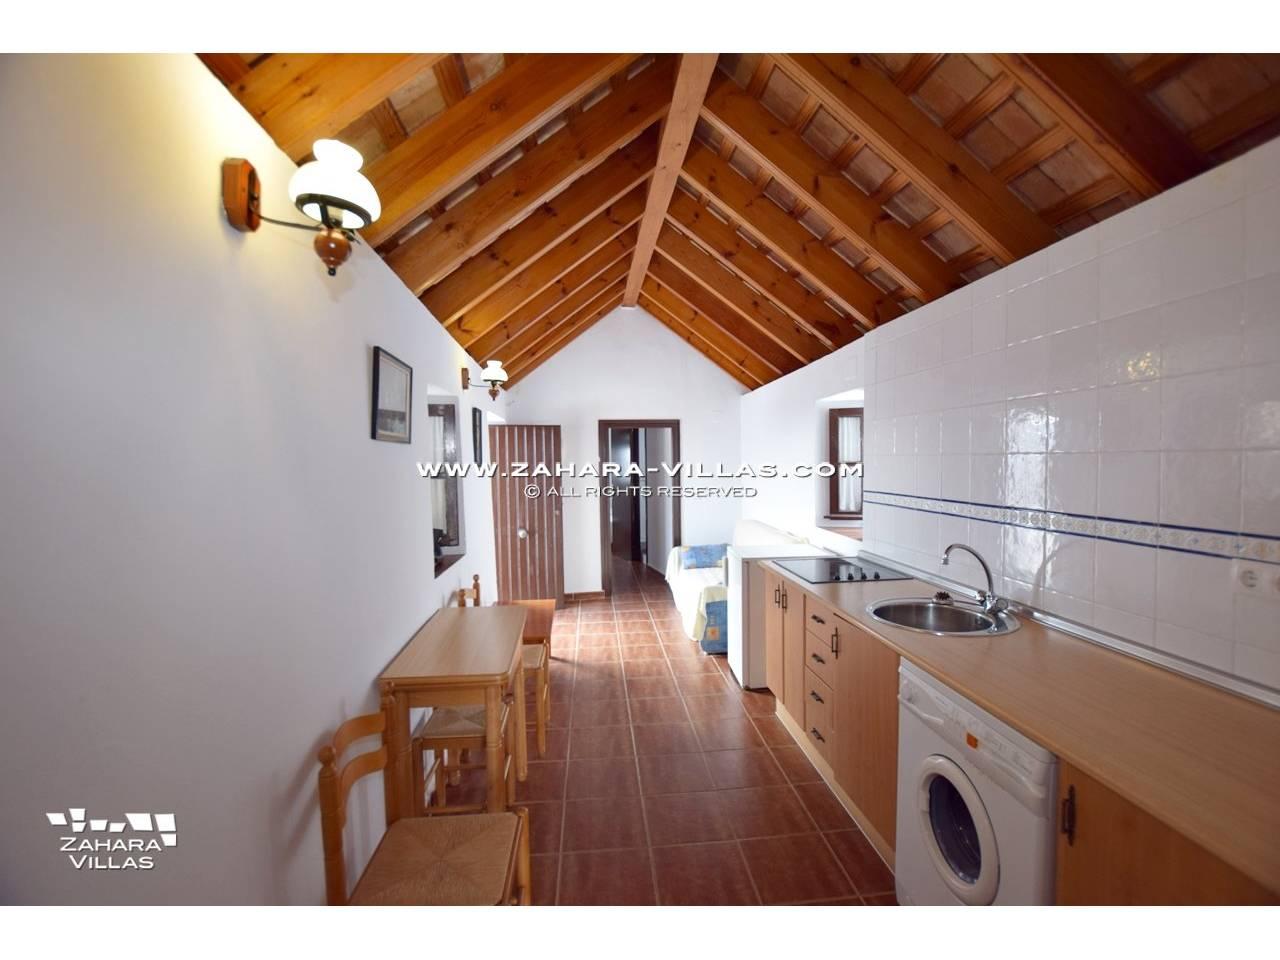 Imagen 2 de House, Apartment and Plot to build in the historic center of Vejer de la Frontera